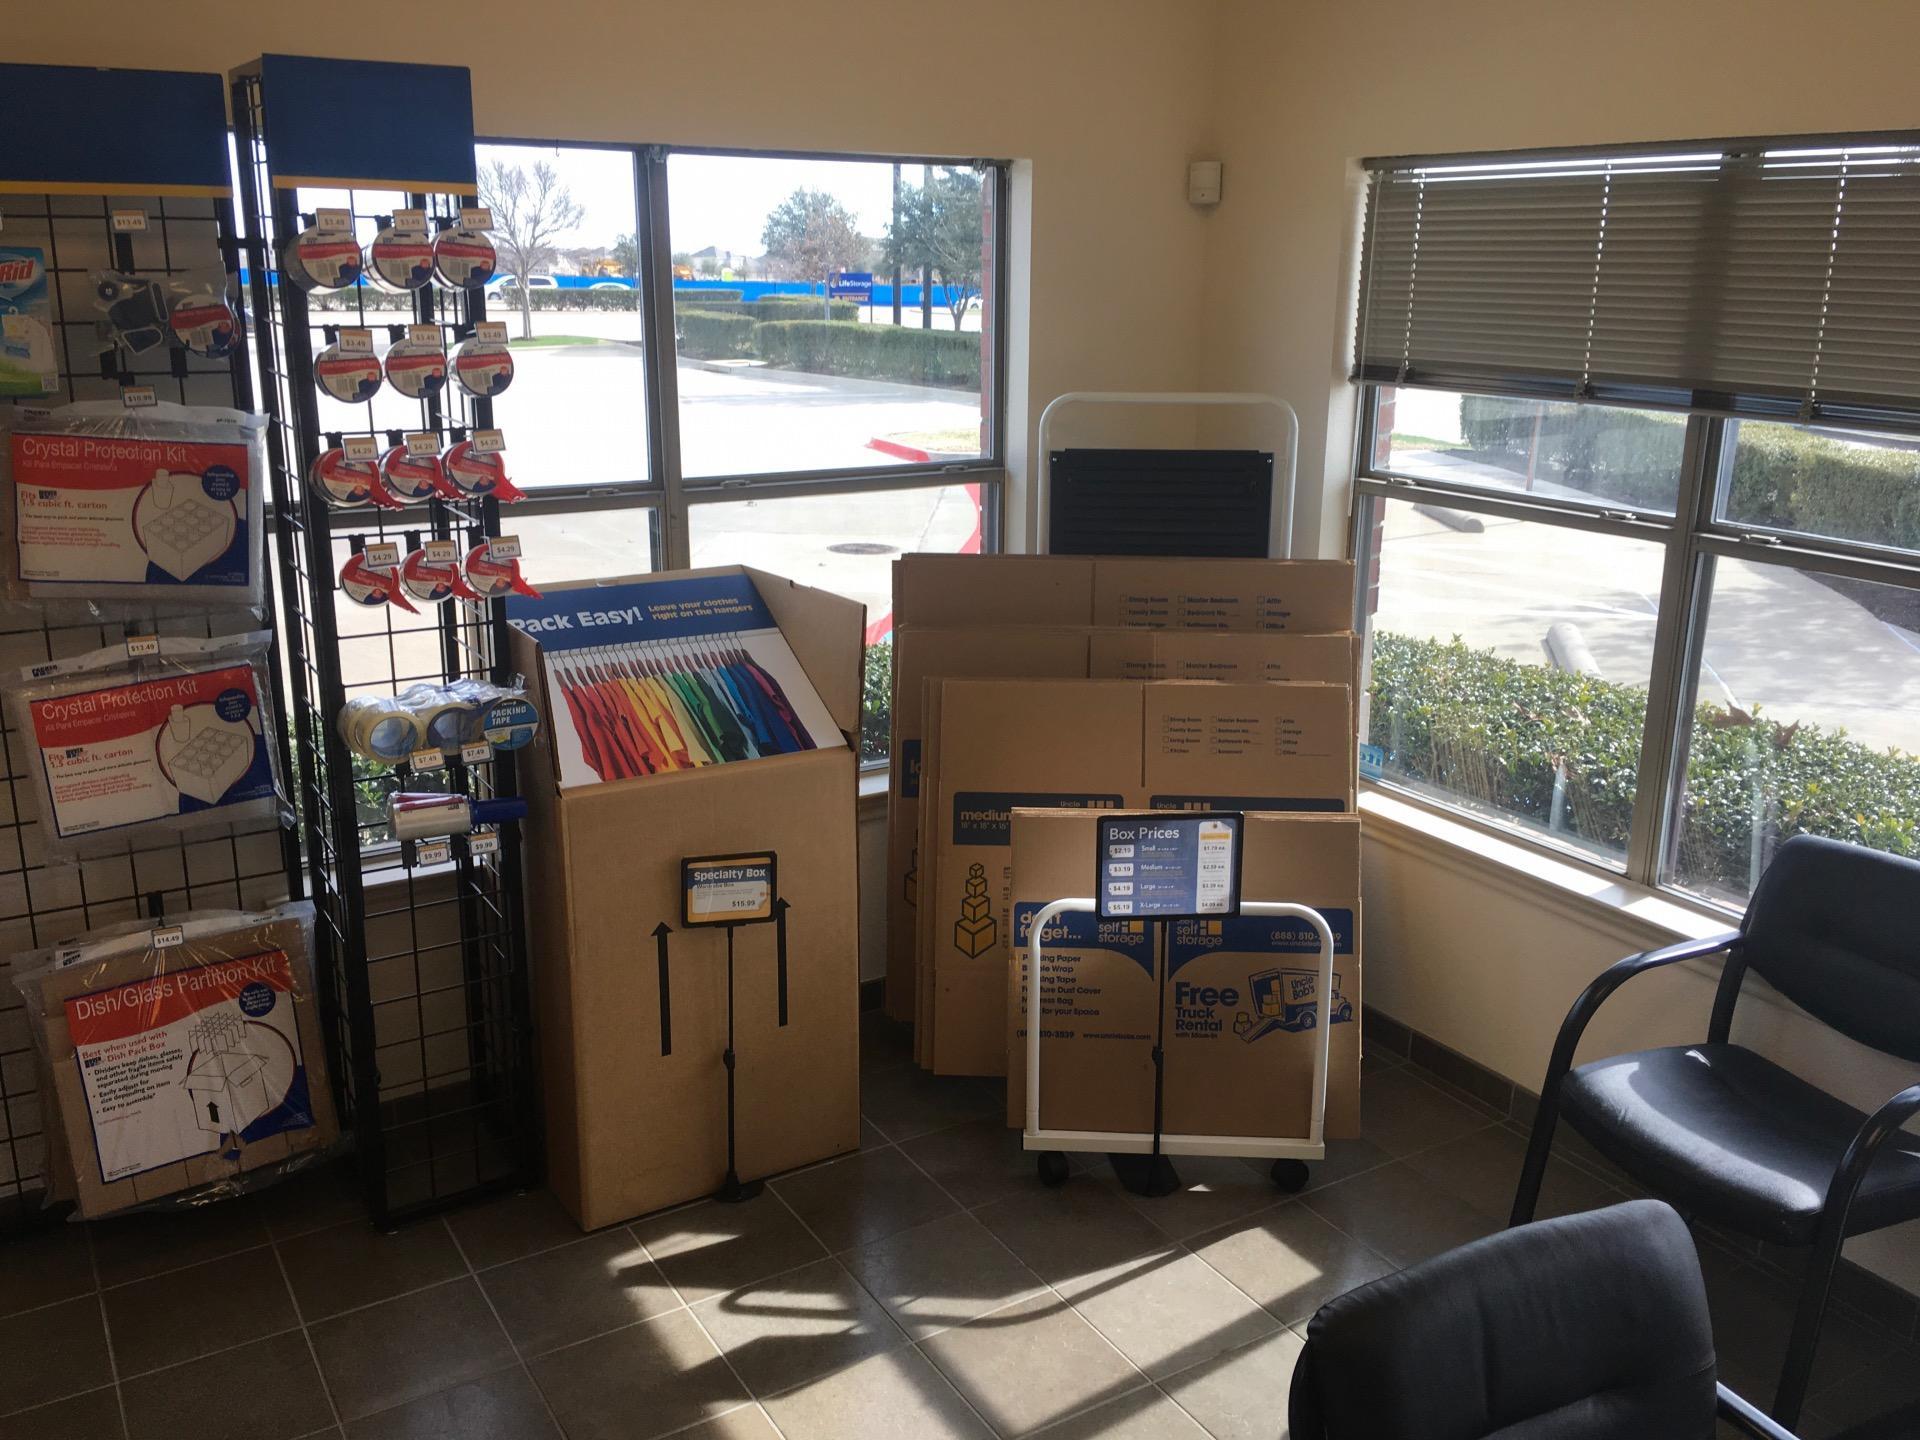 Life Storage In Lewisville 2710 Denton Tap Rd Rent